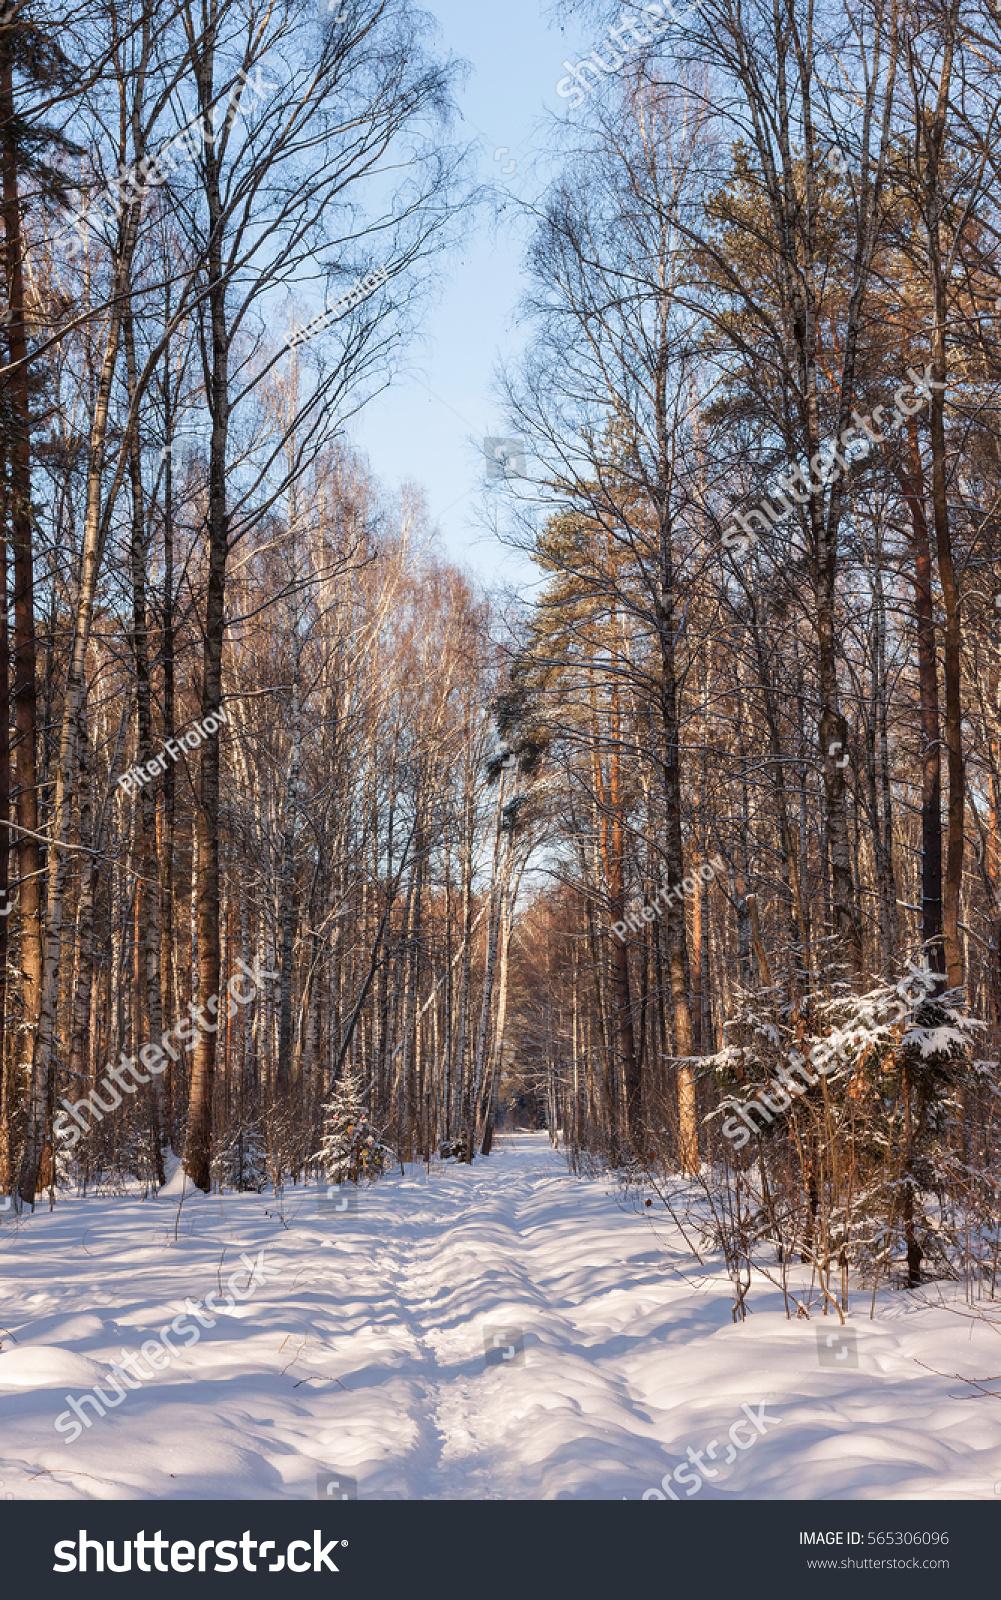 русский снег сайт запчасти на снегоход